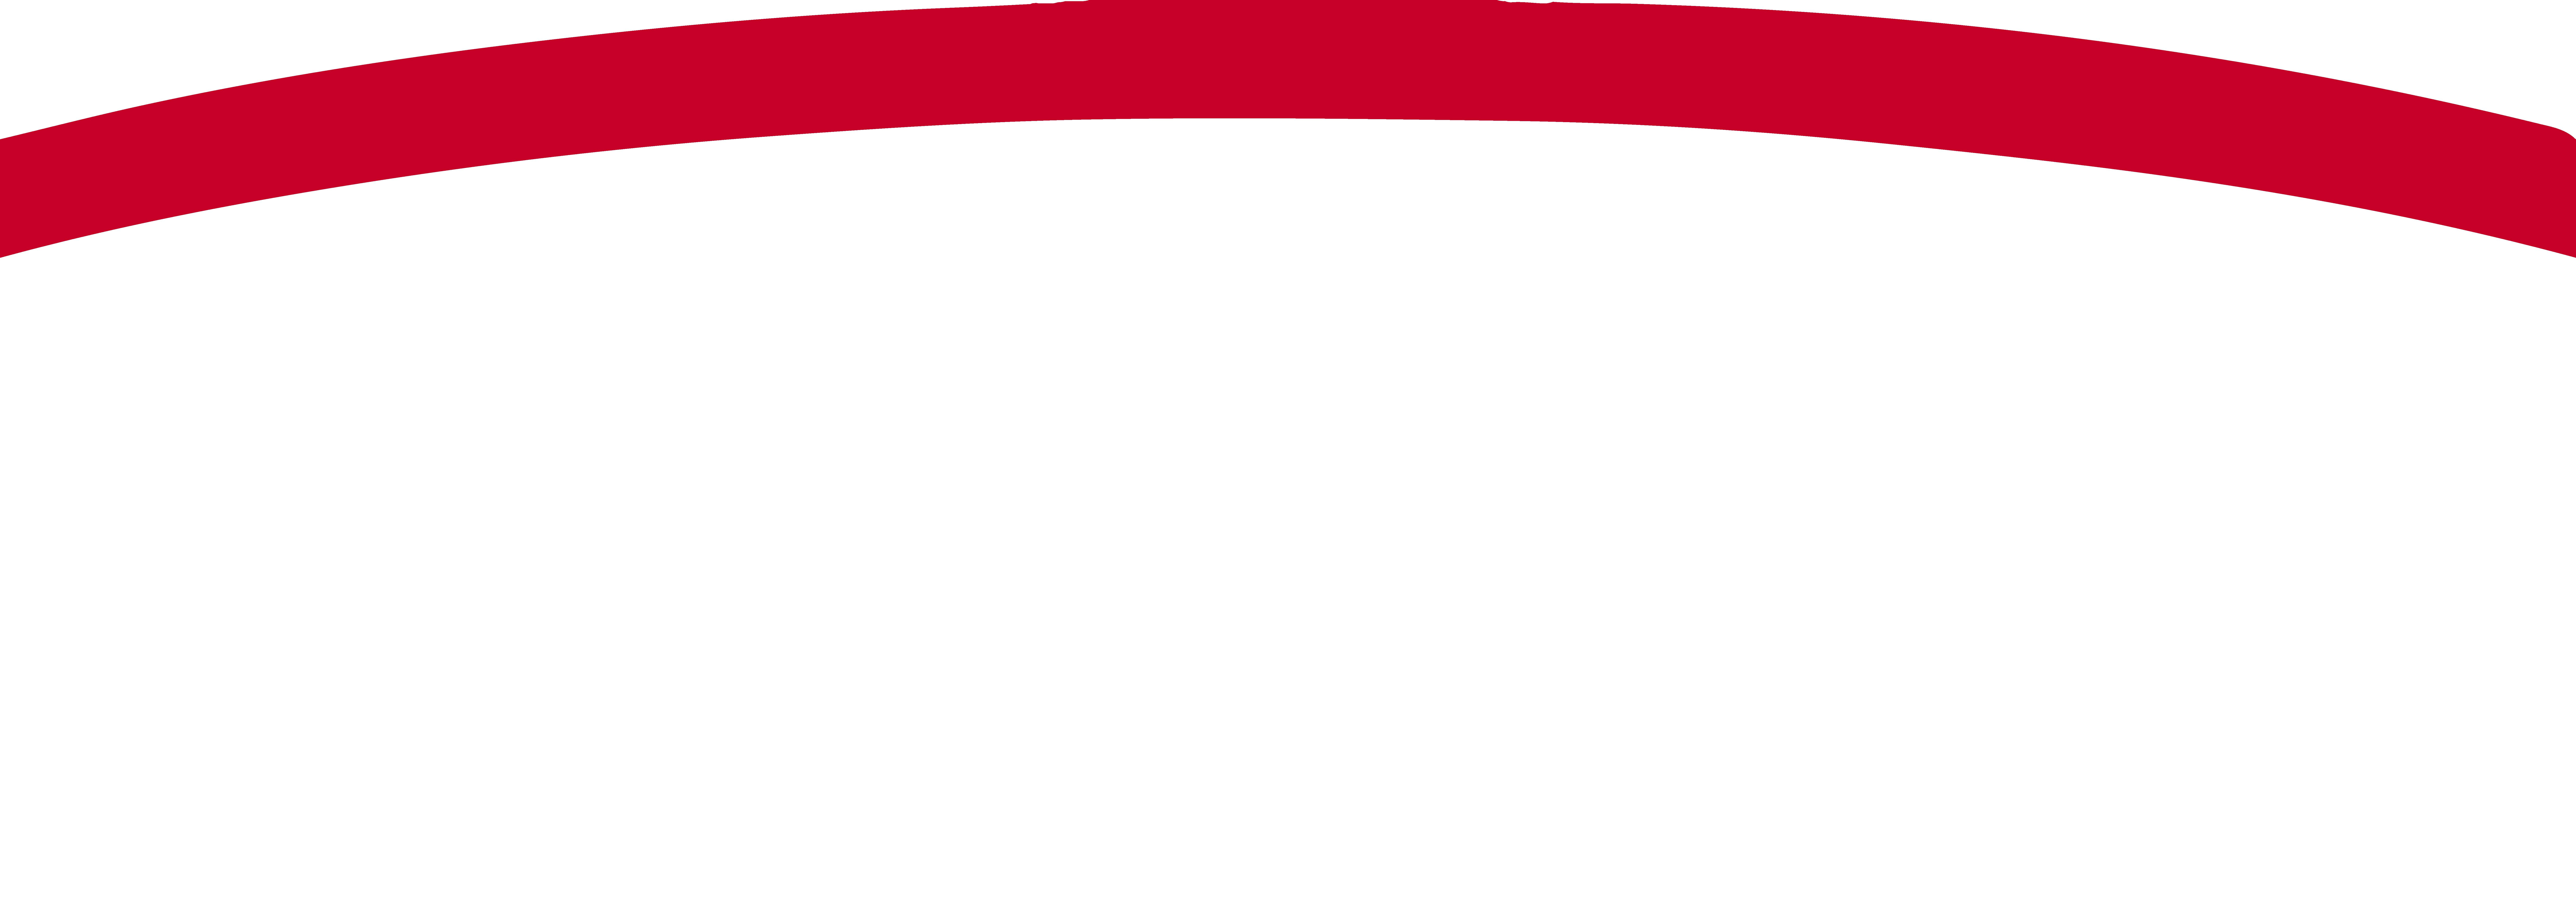 ICMG Partners